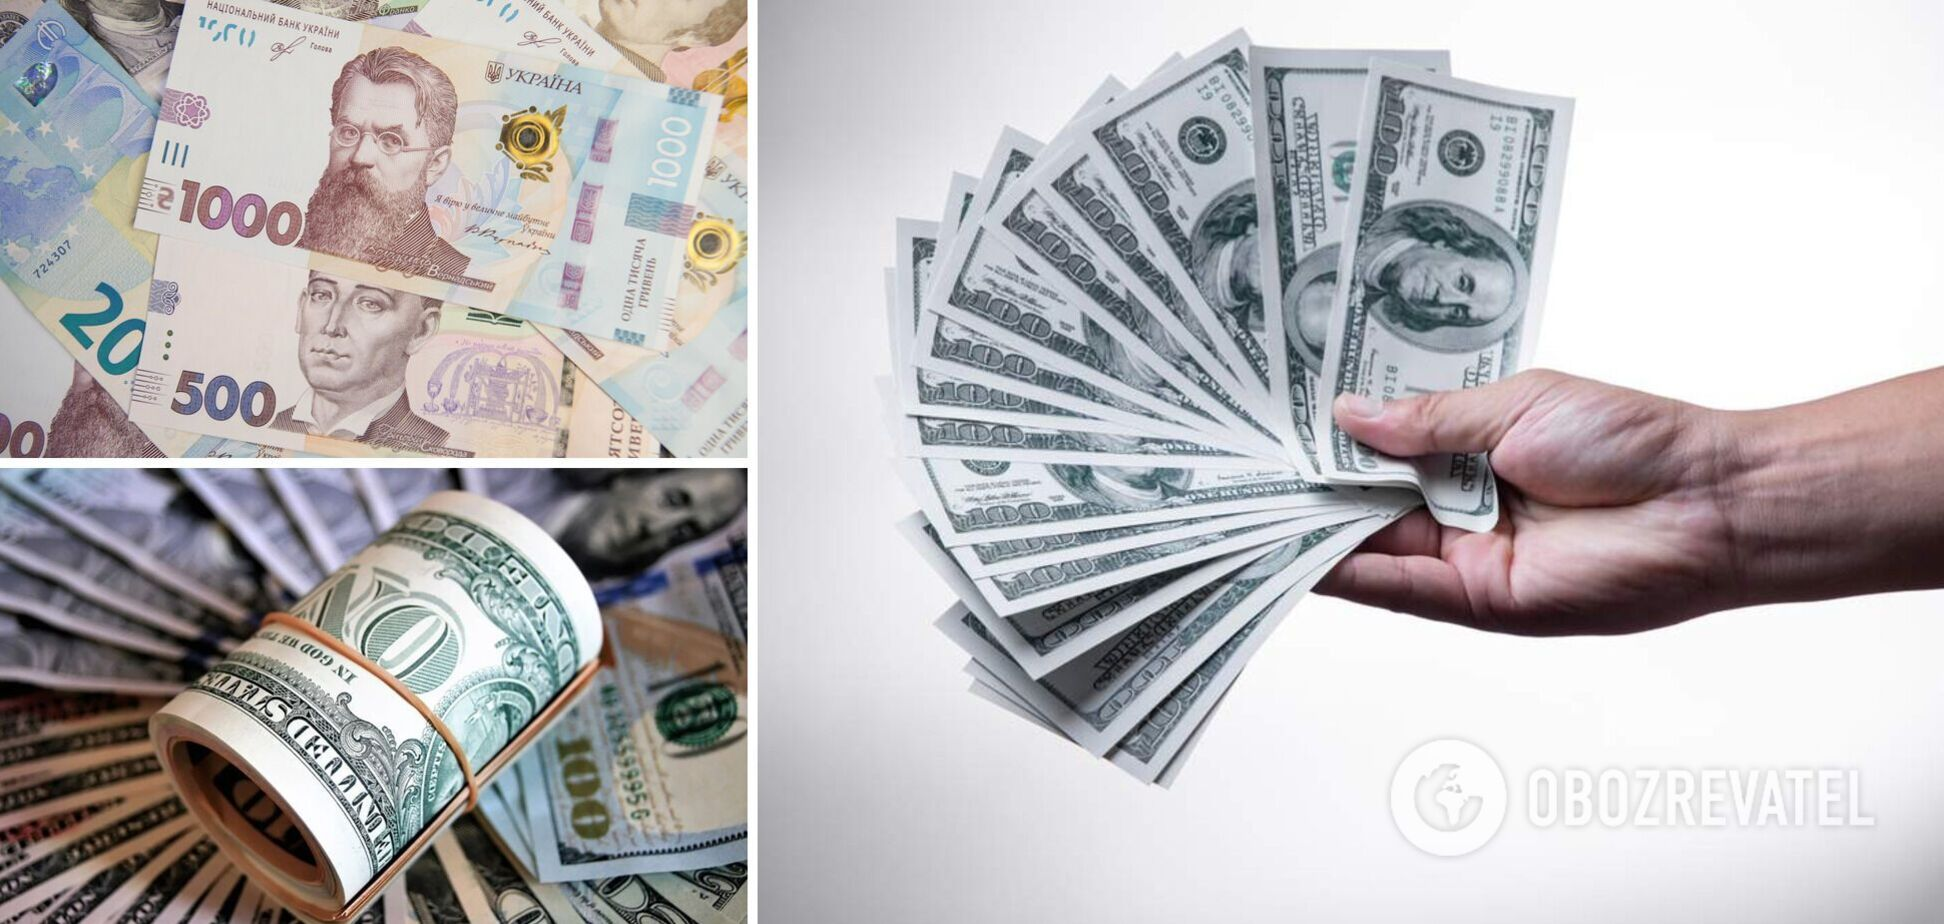 Курс доллара в Украине может снизиться до конца октября